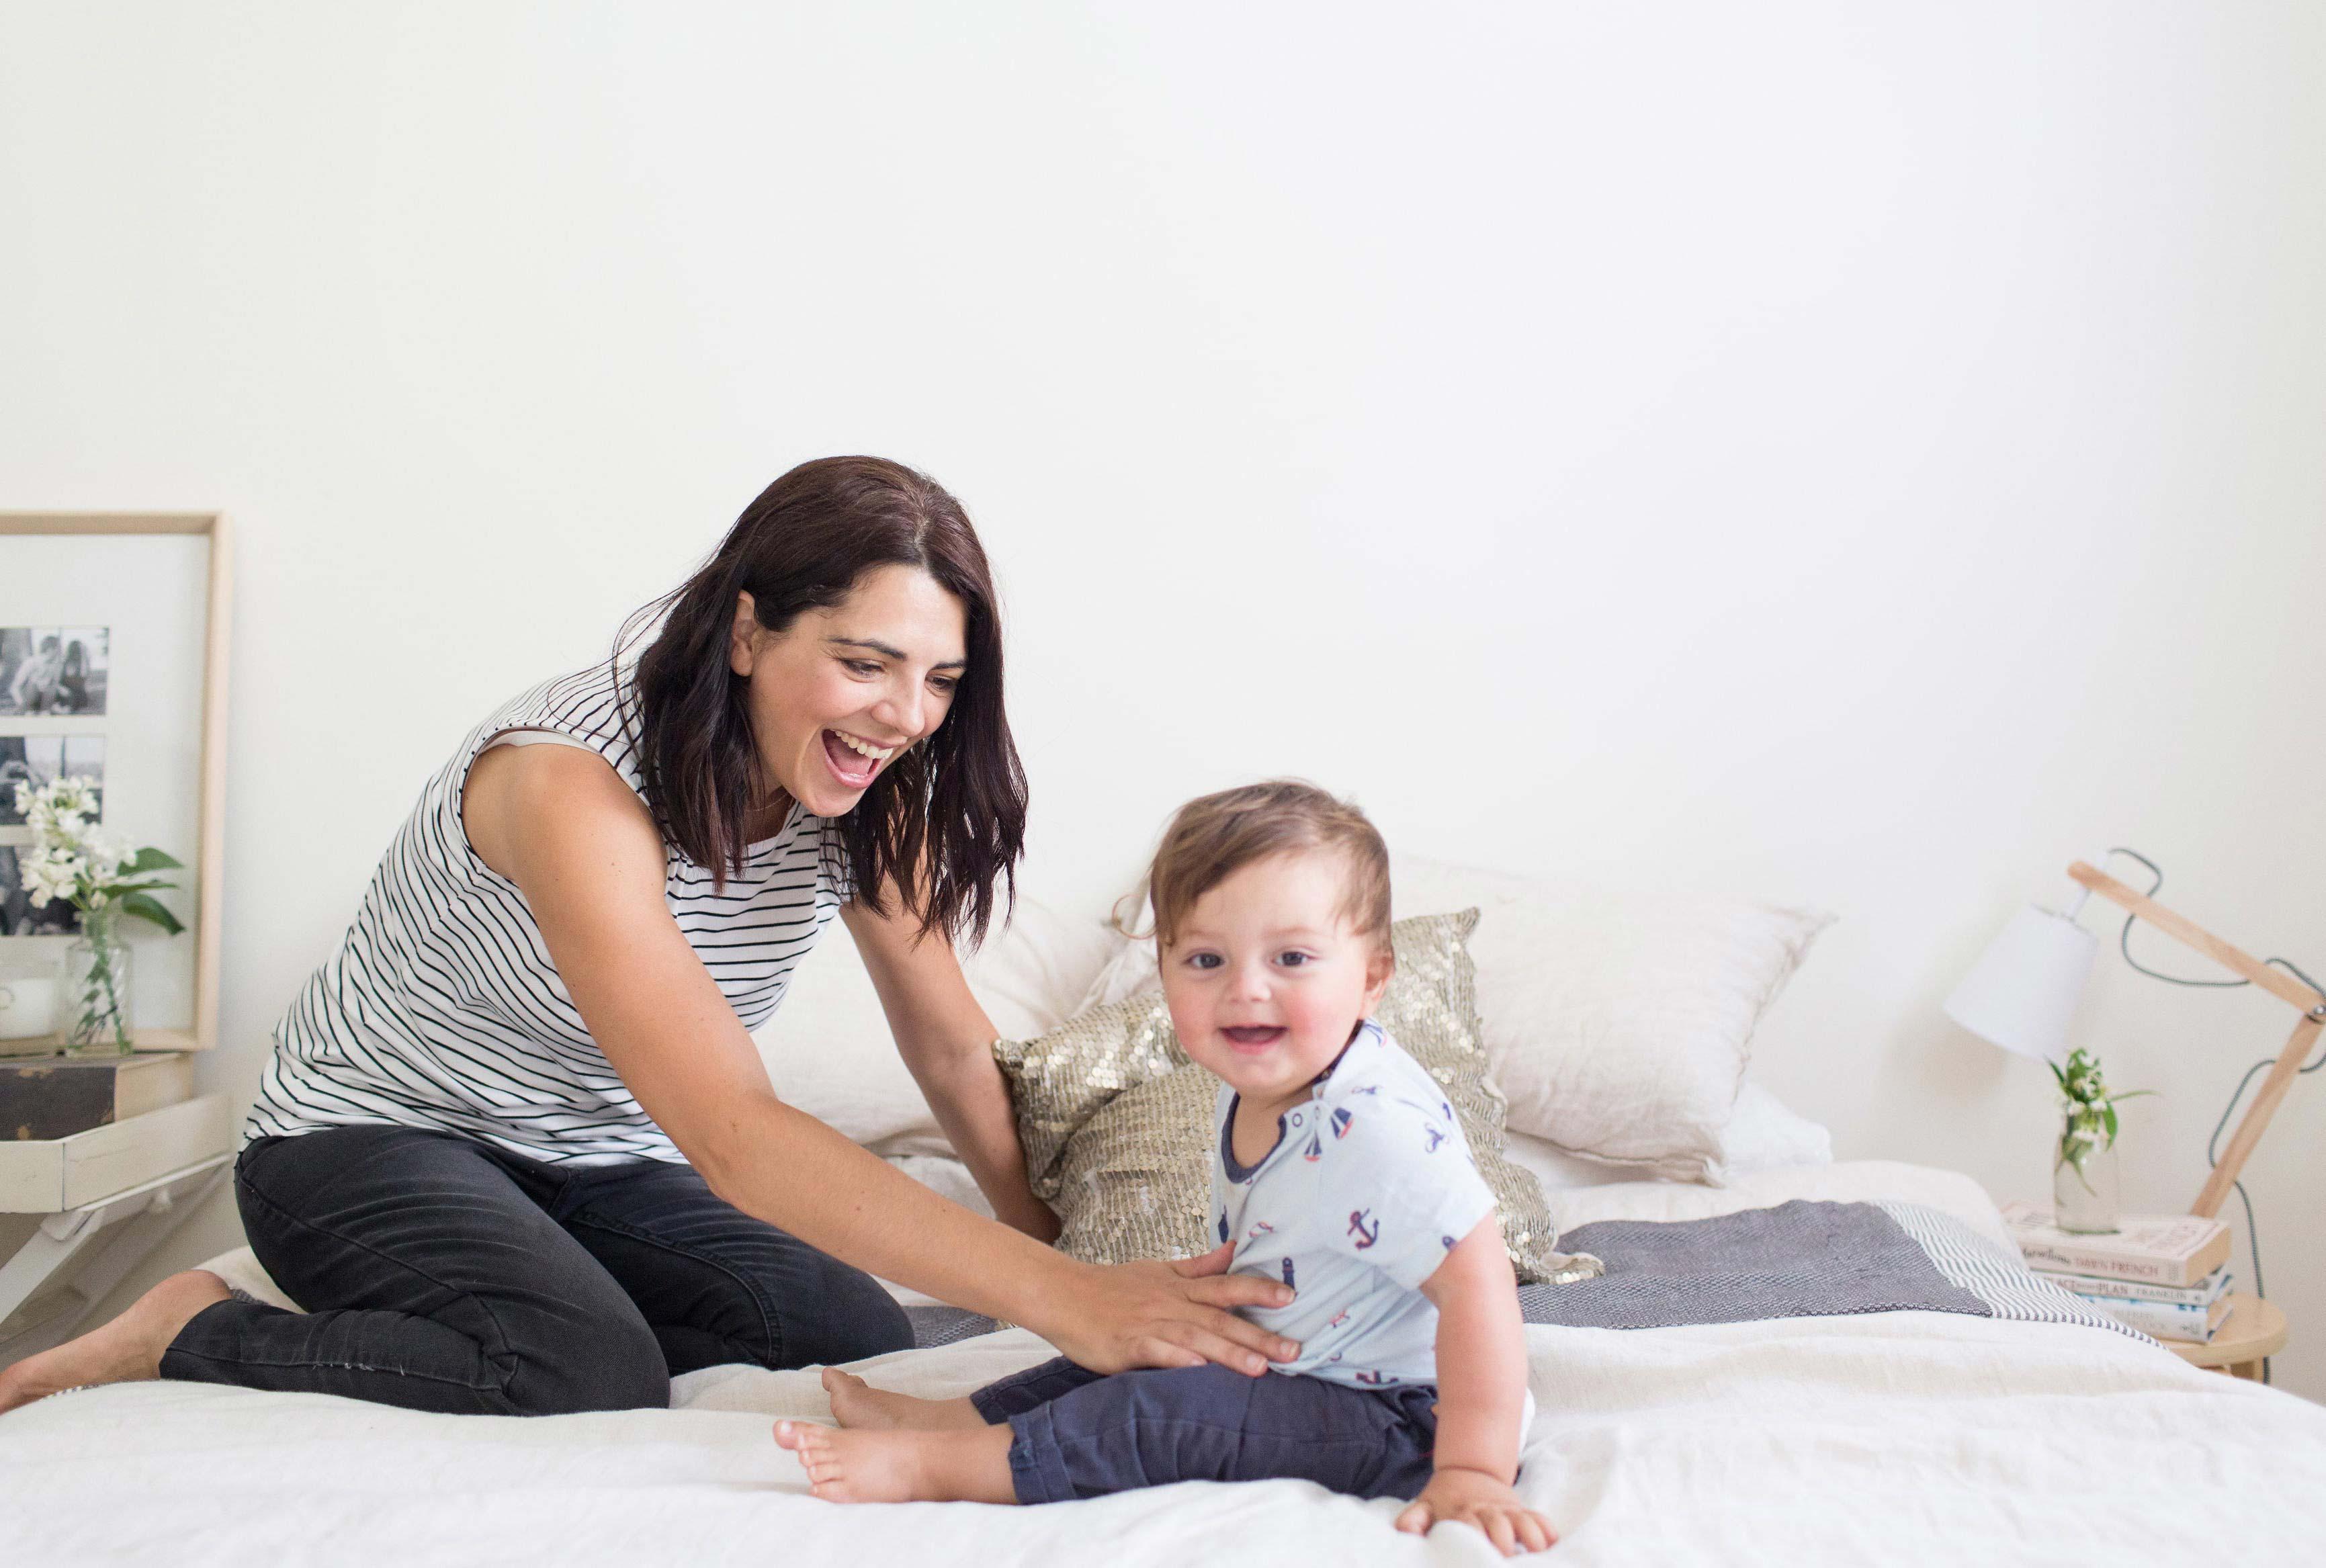 #mygracetale: Stella Gaffney, Teacher and Blogger, Mother to Eva & Luca